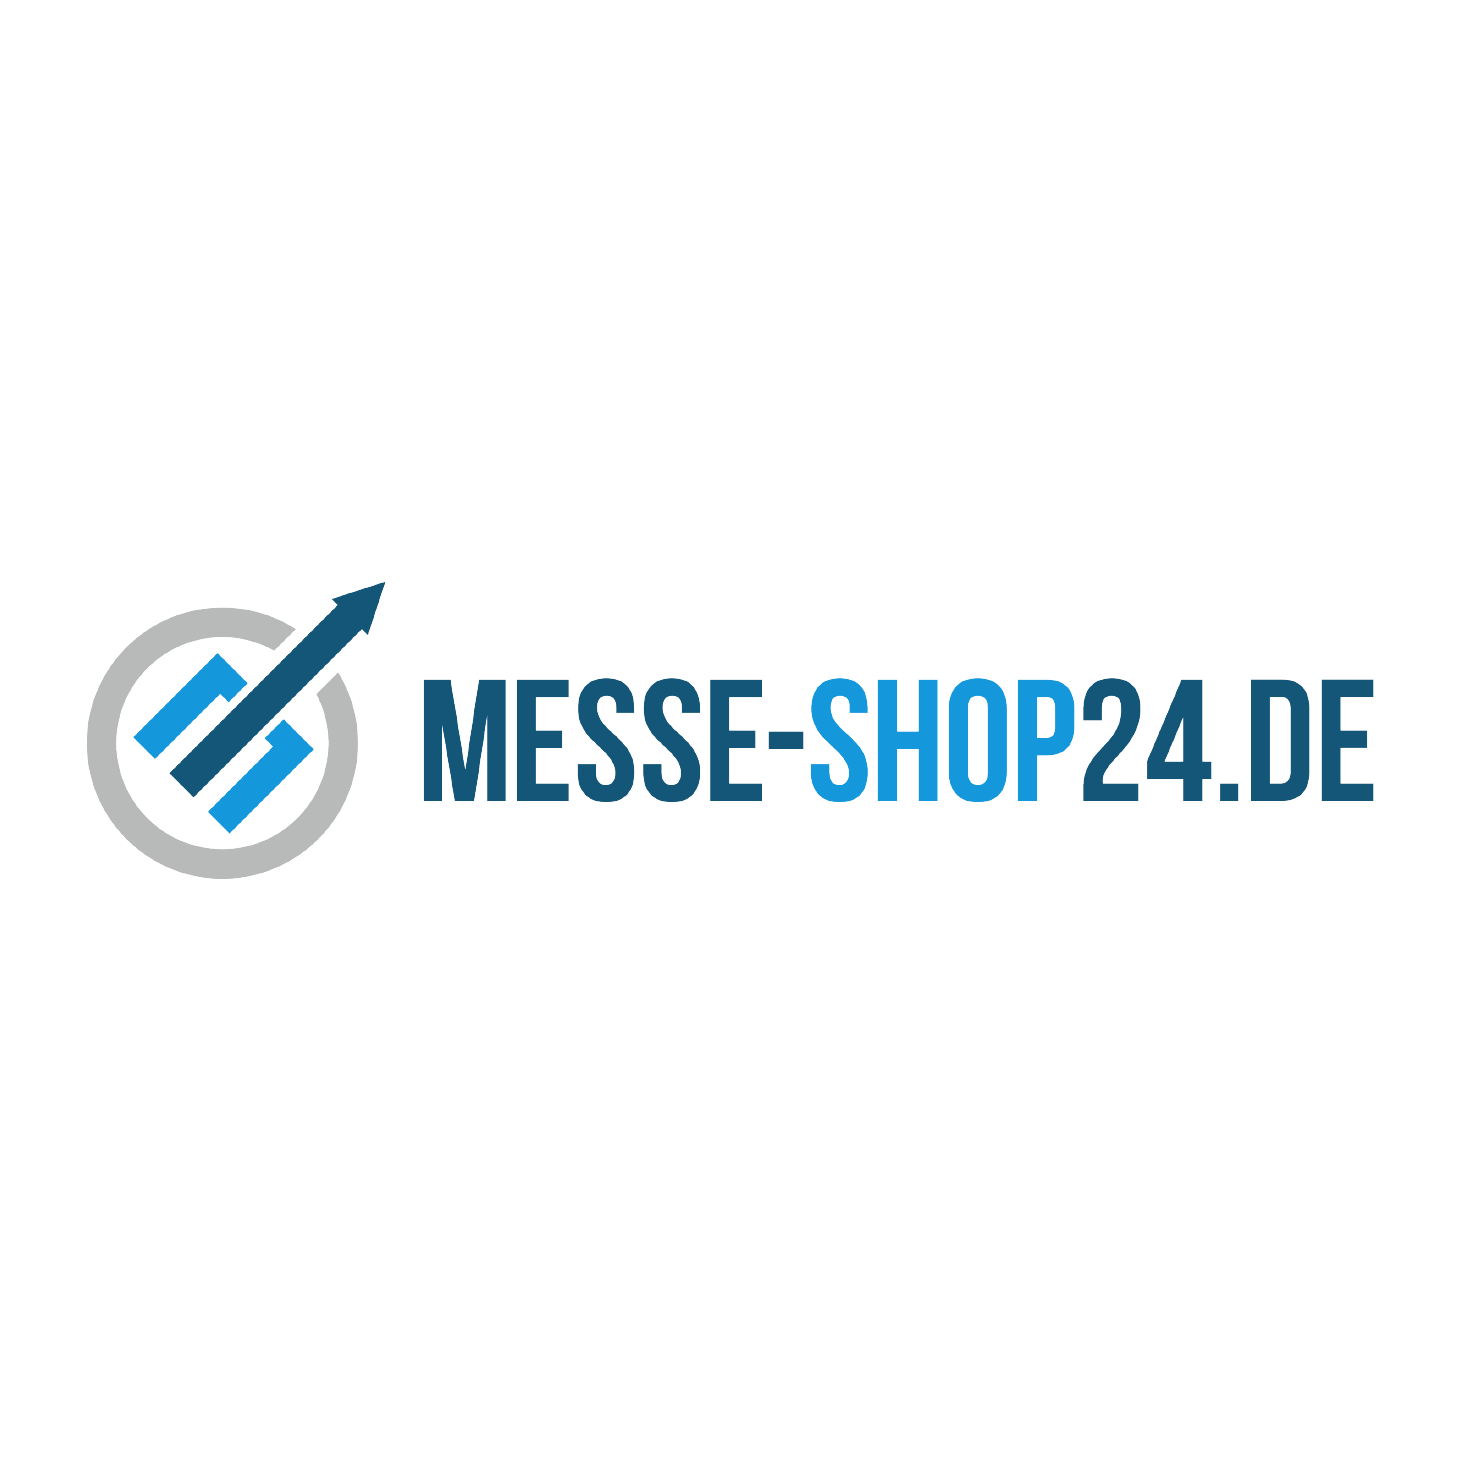 Logo__messehsop_24 color